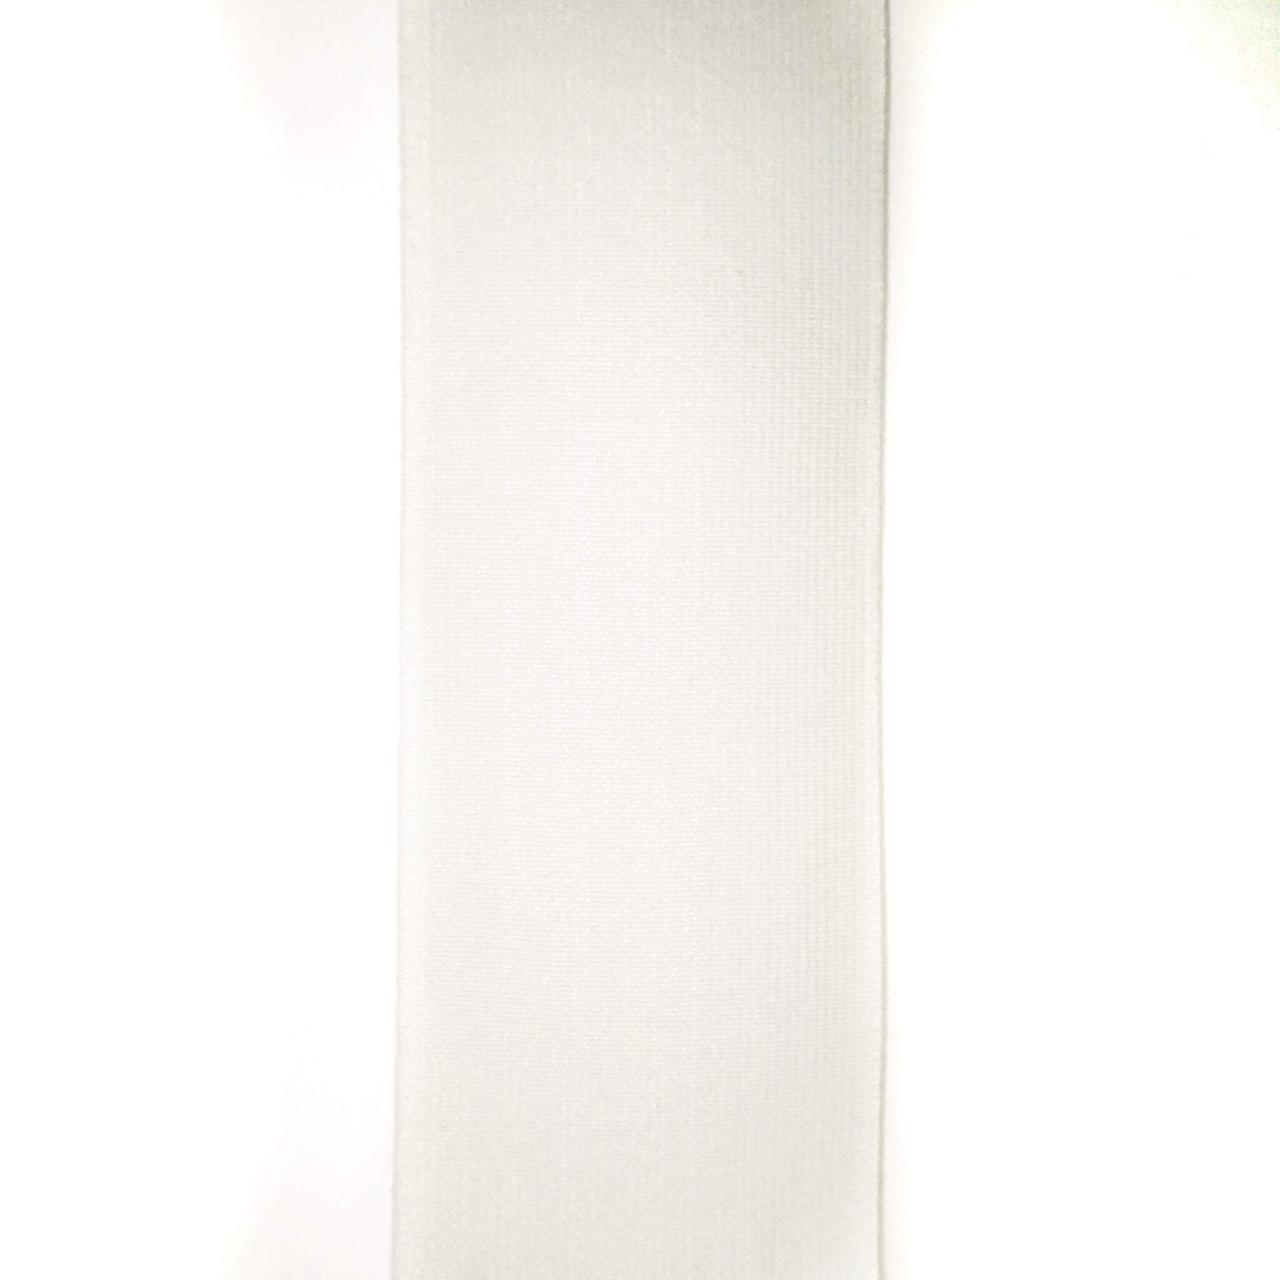 Стрічка еластична 60 мм (50м/рулон)